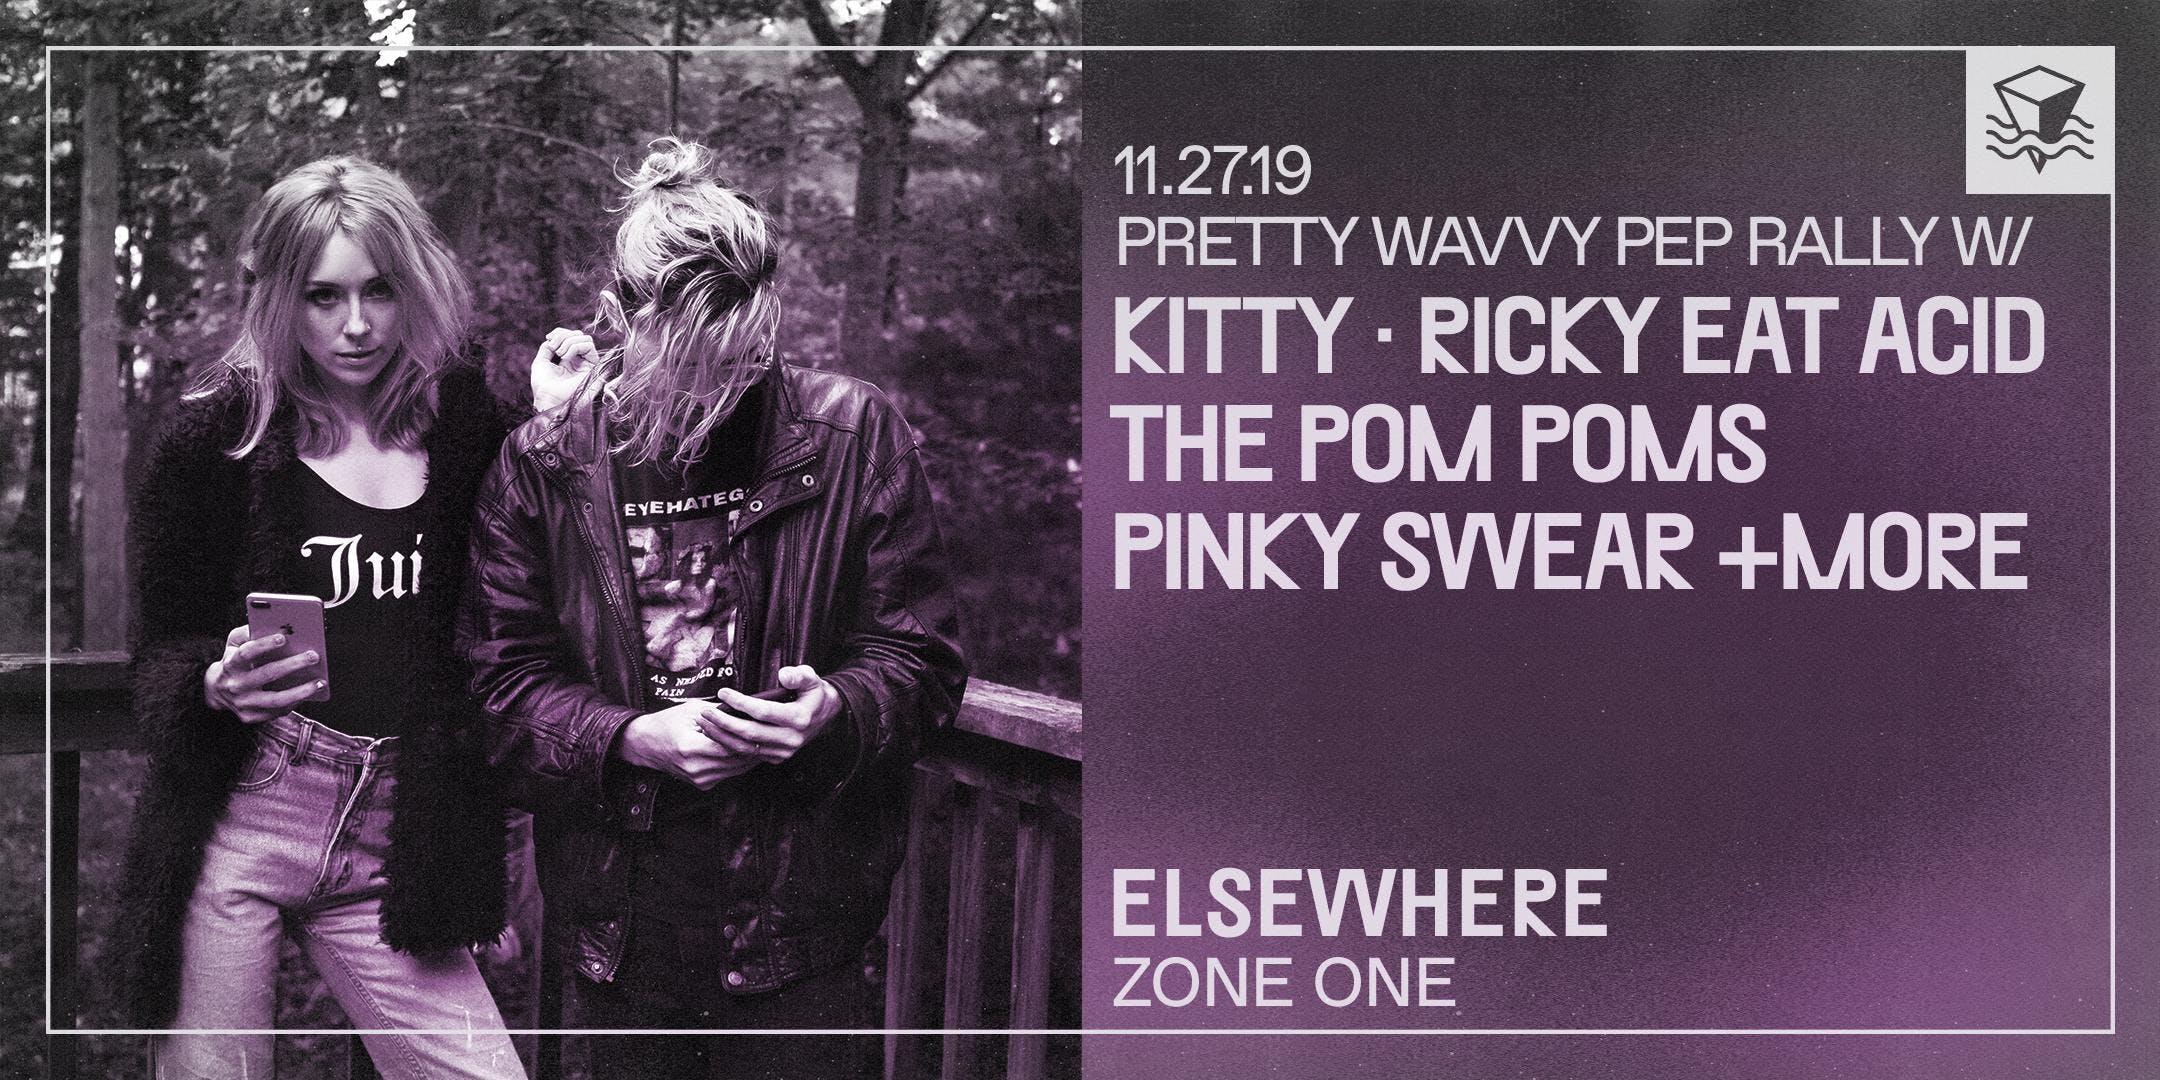 Pretty Wavvy Pep Rally w/ Kitty, Ricky Eat Acid, The Pom Poms, Pinky Swear +more